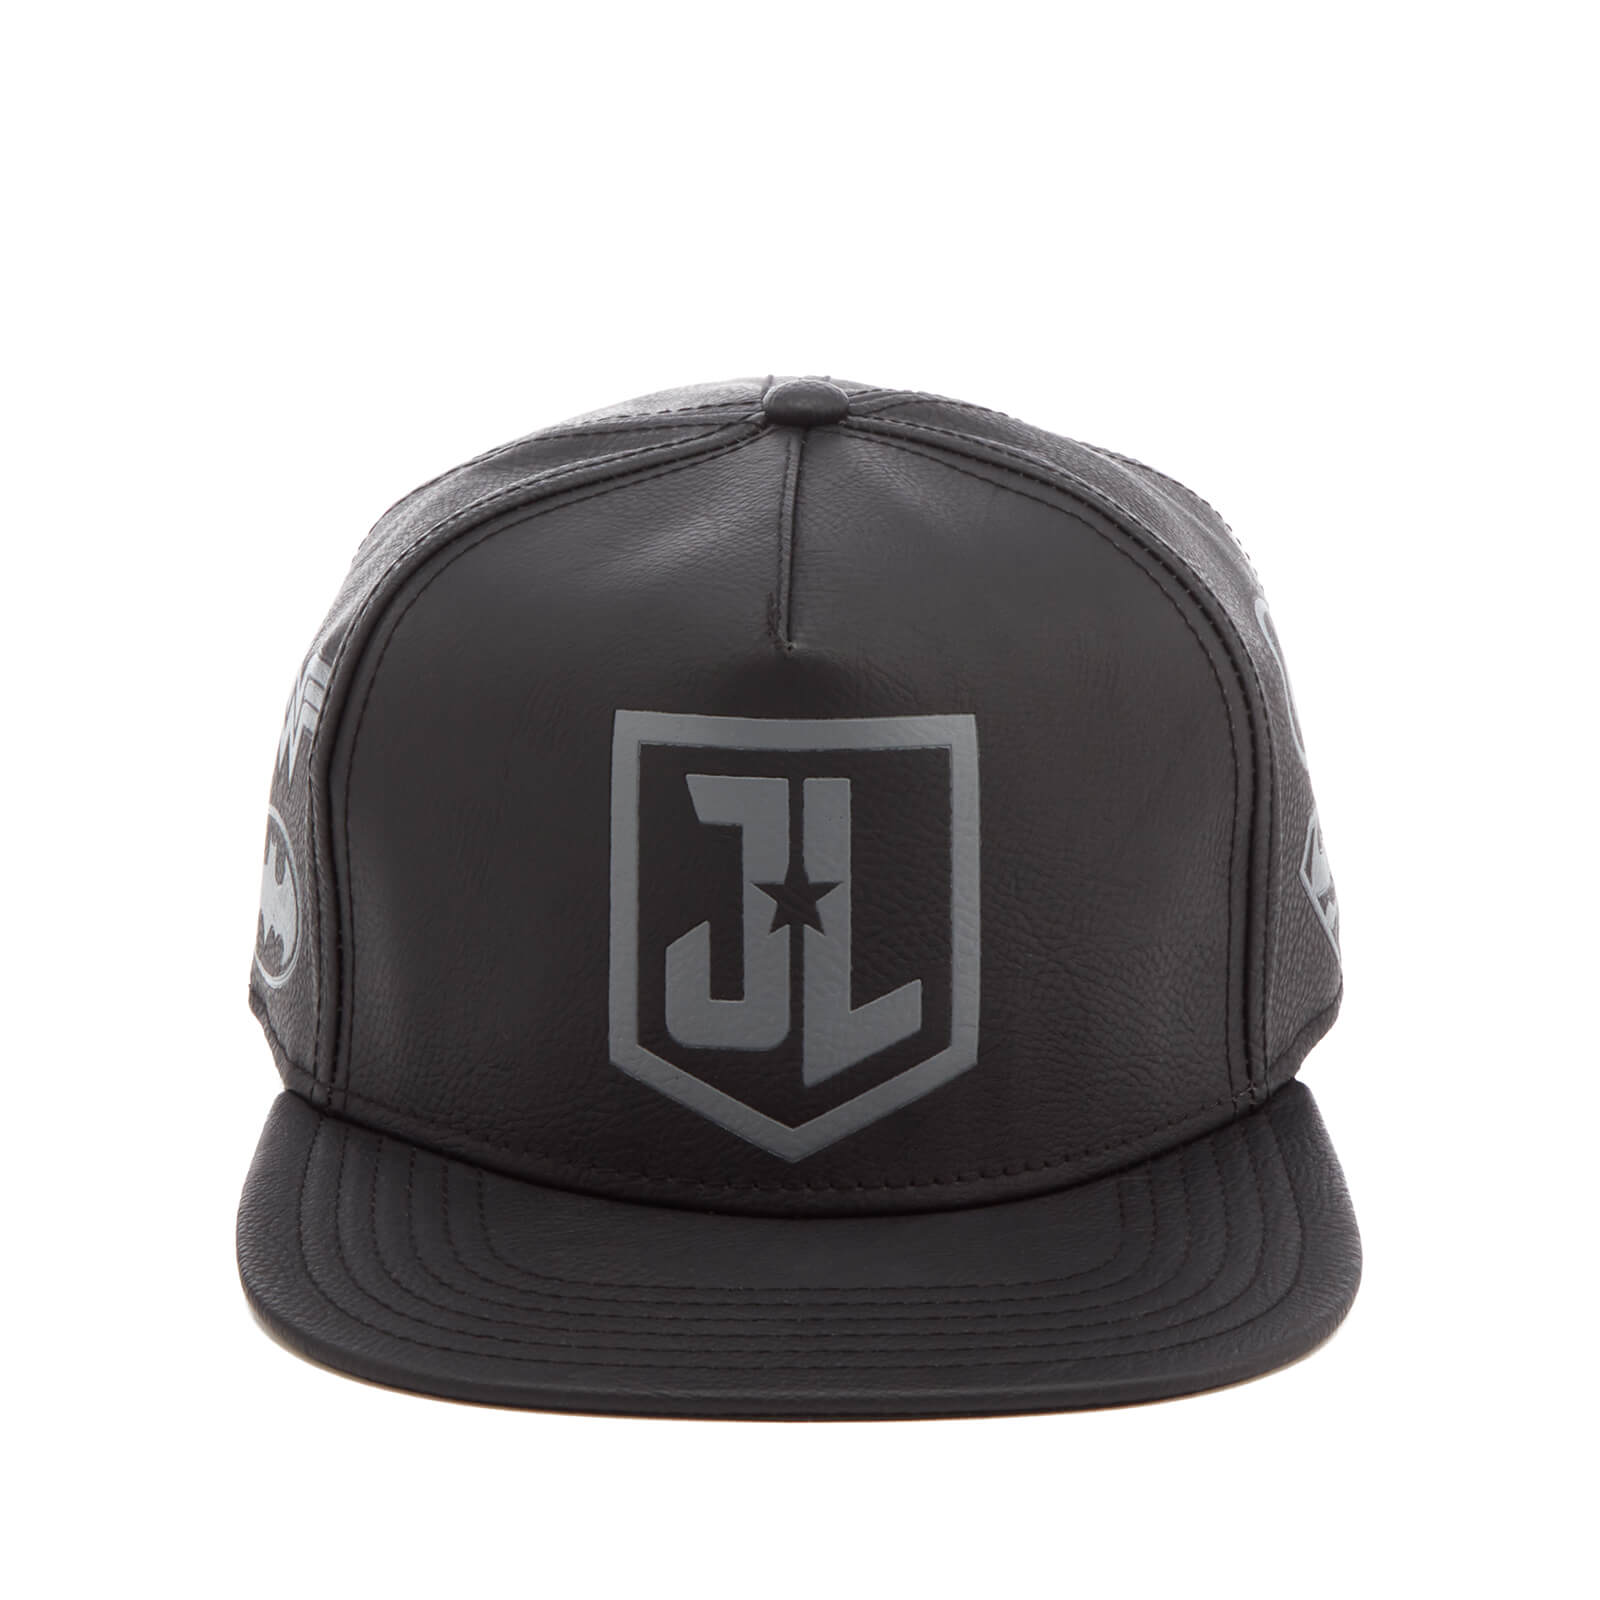 7481ee3edc16a DC Comics Justice League Men s Debossed Logo Cap - Black Merchandise ...